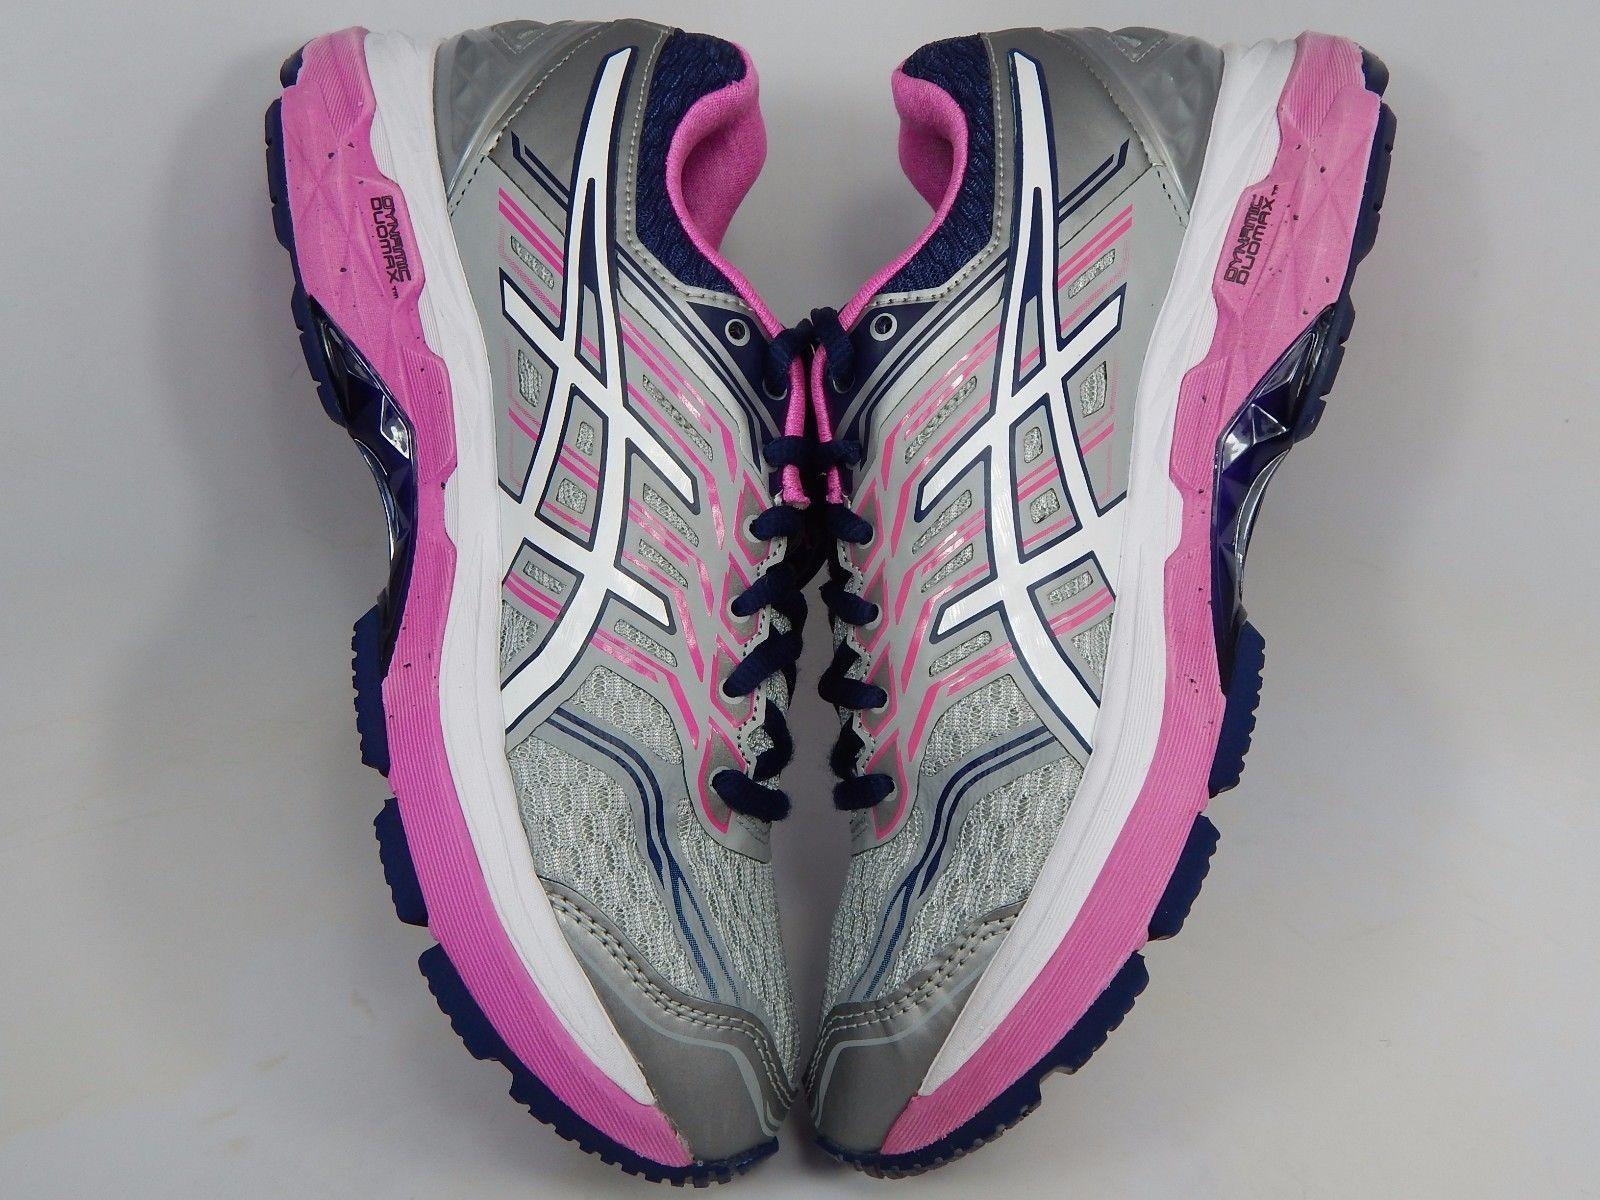 Asics GT 2000 v 5 Women's Running Shoes Size US 7.5 M (B) EU 39 Silver T757N